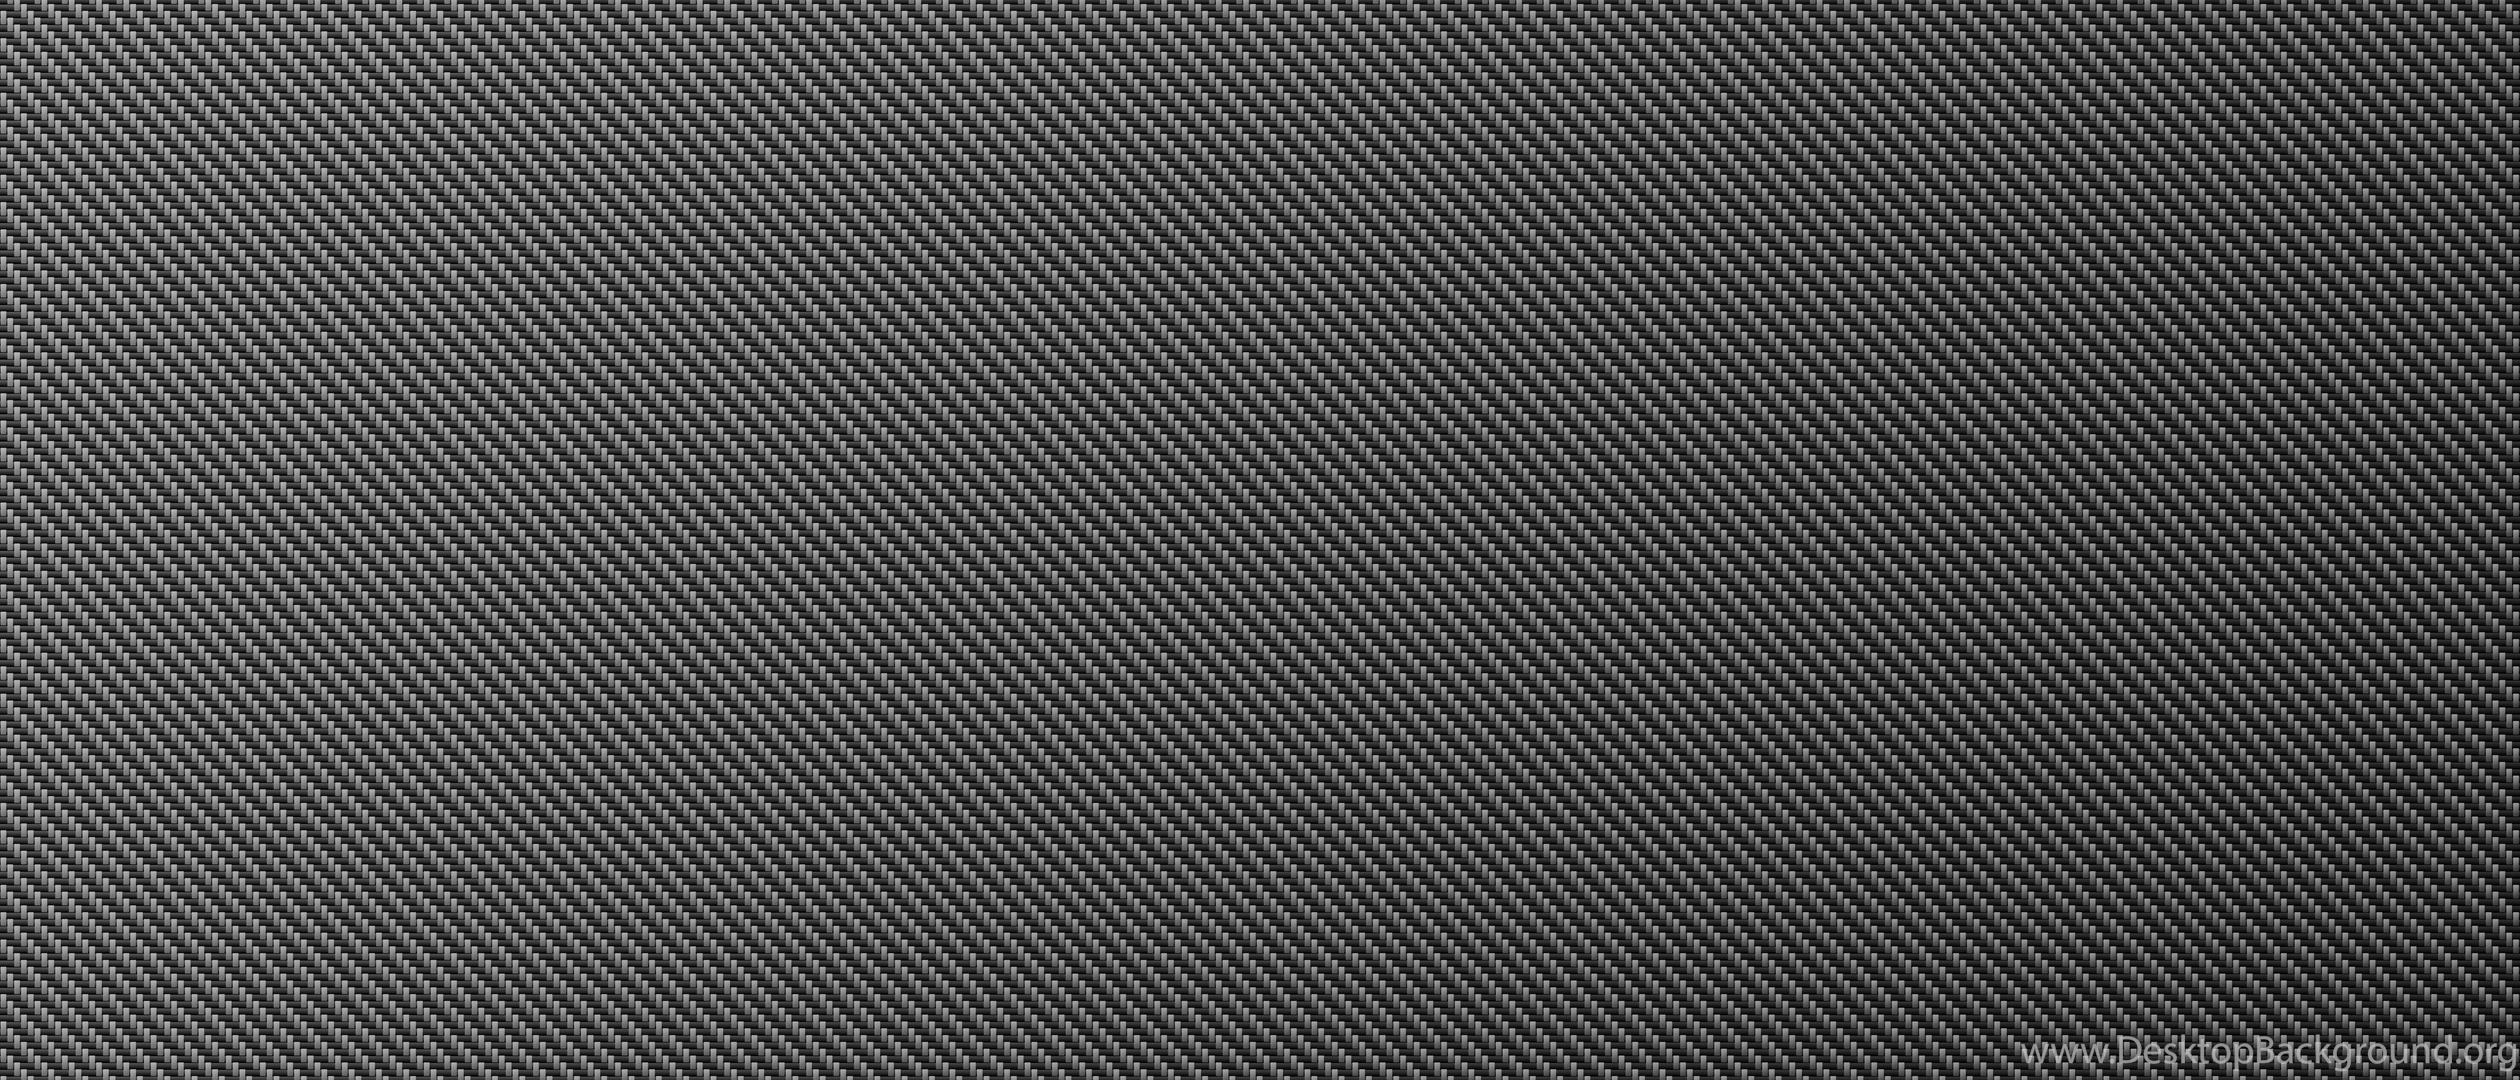 Download Carbon Fiber Texture Boy Resources Stock Images Textures ... Desktop Background